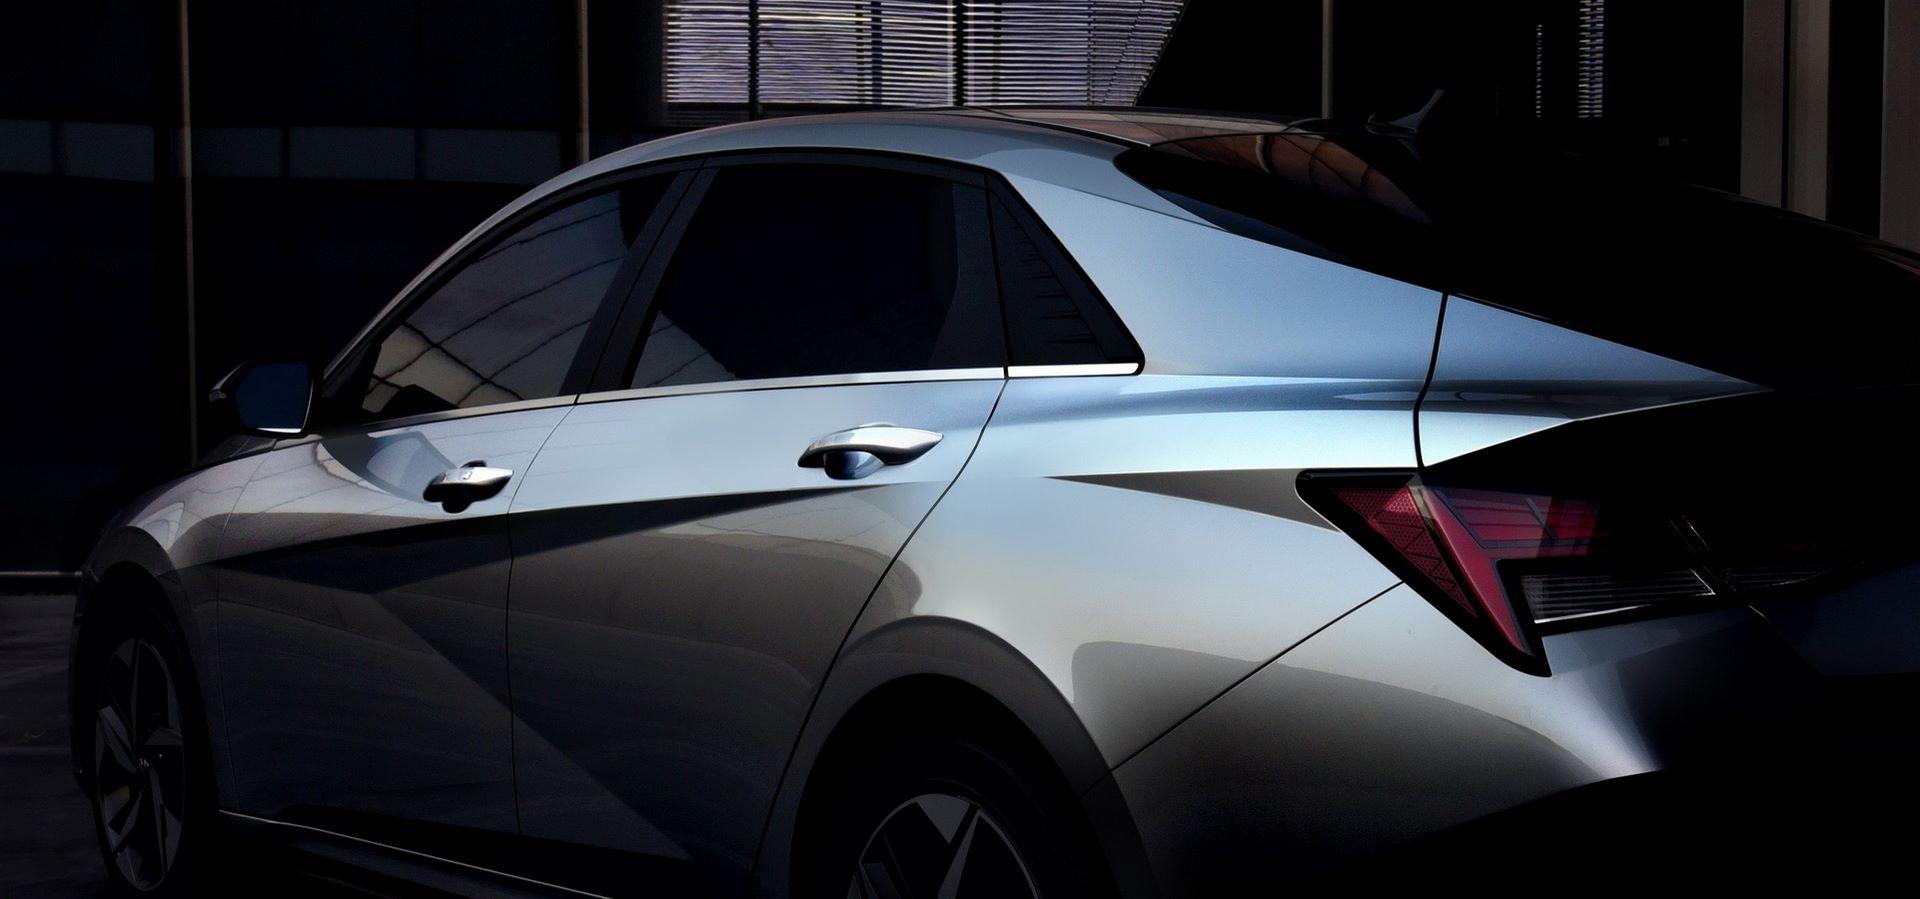 Hyundai-Elantra-2021-17